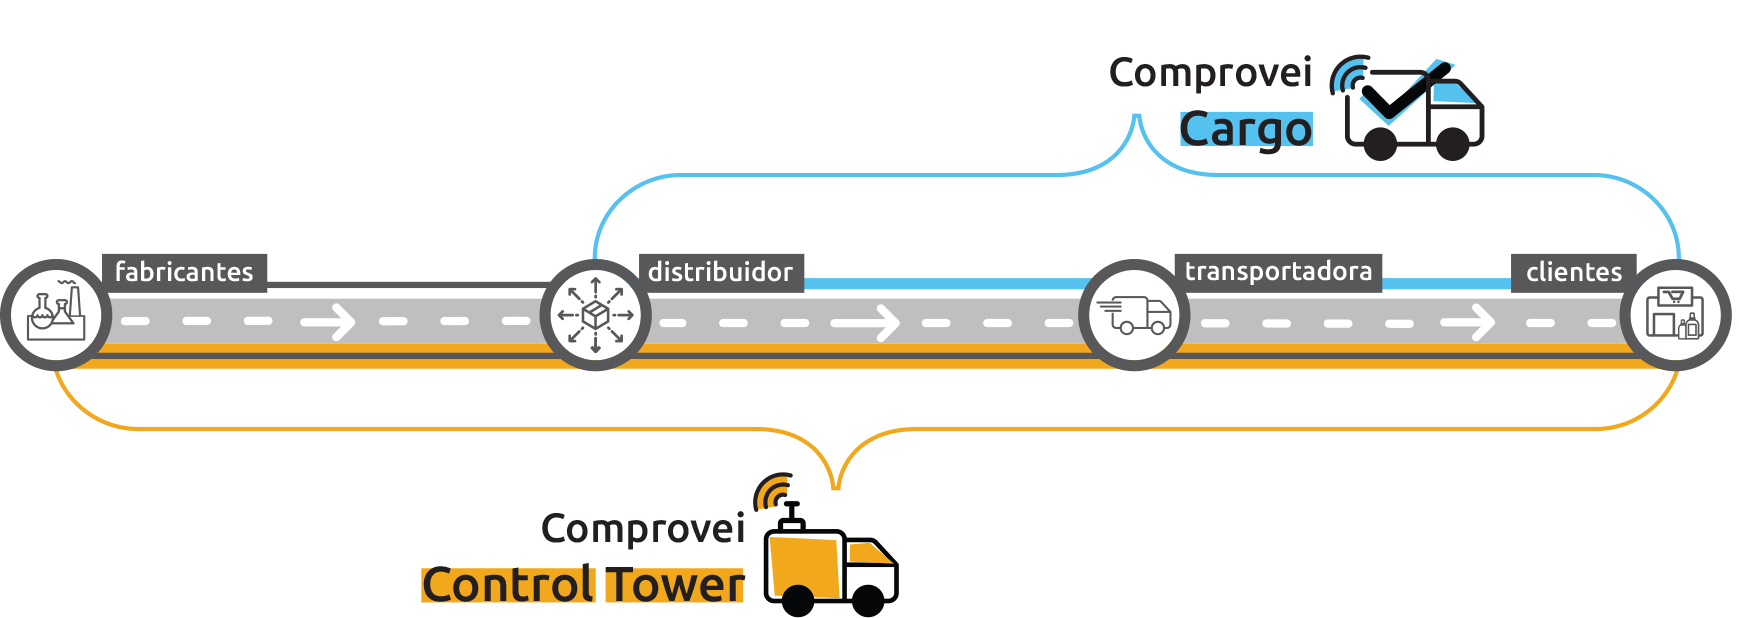 controe-tower-etapas